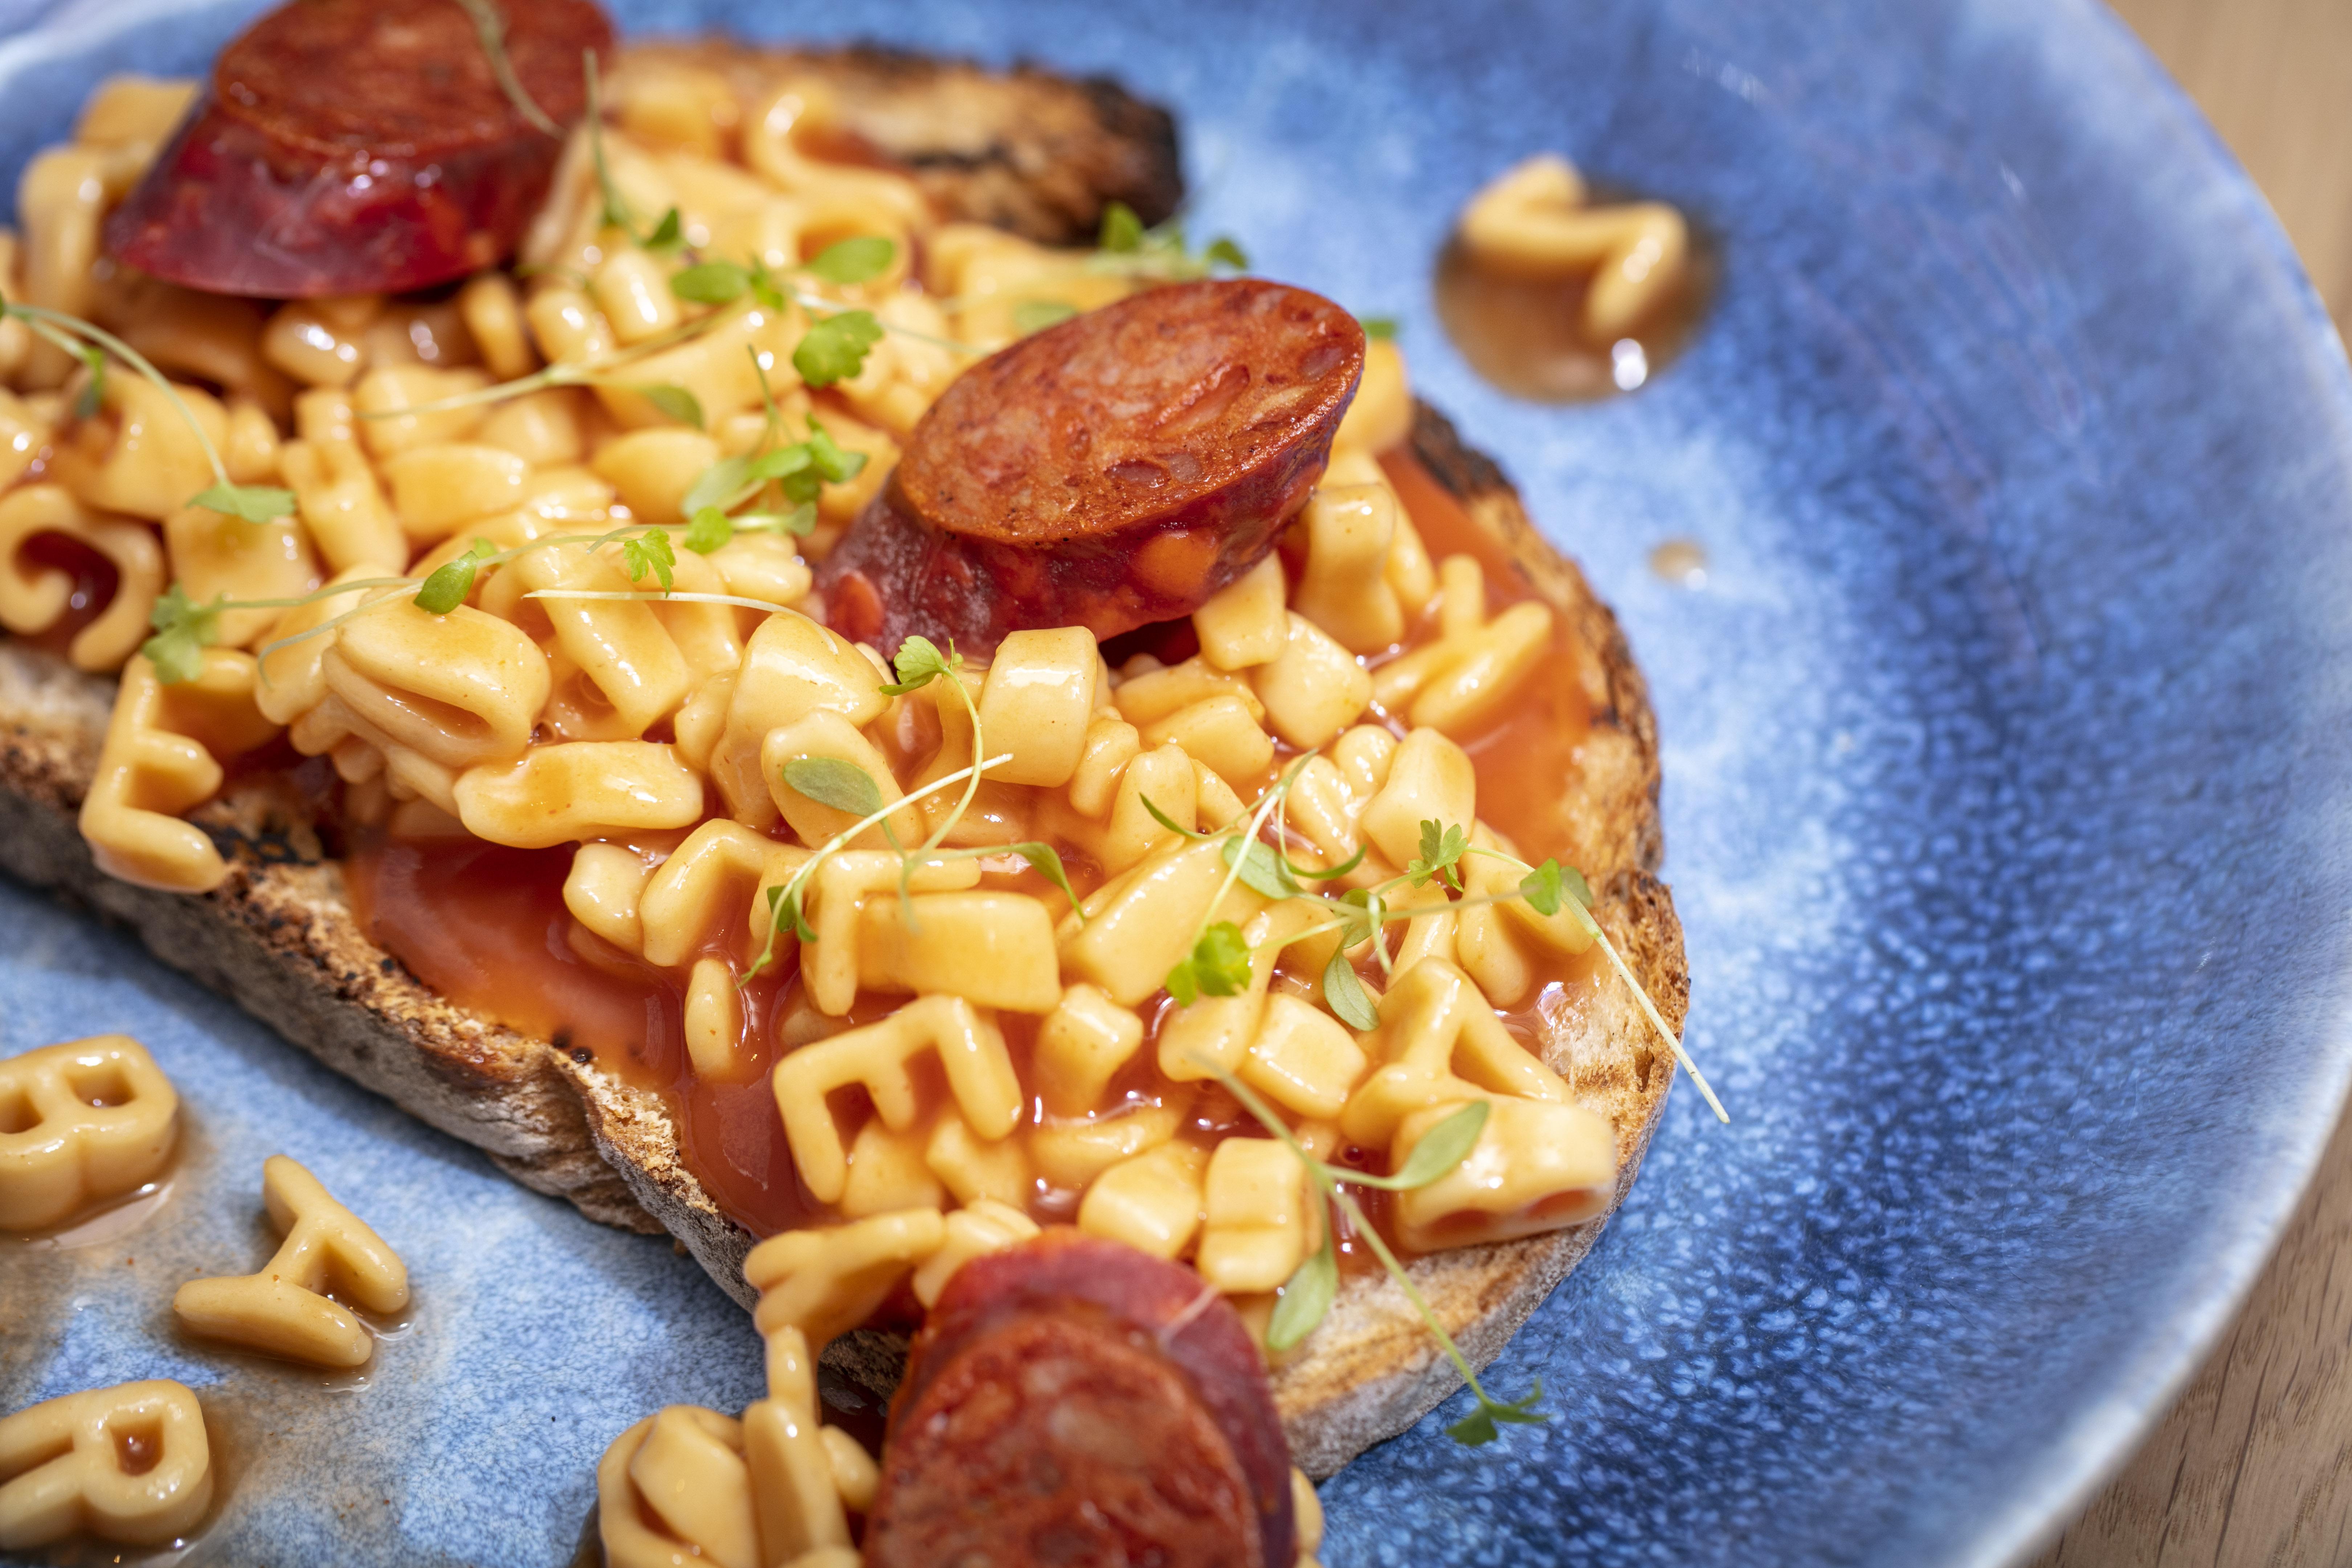 Bluebird Chelsea's White City restaurant puts alphabet spaghetti on its new brunch menu